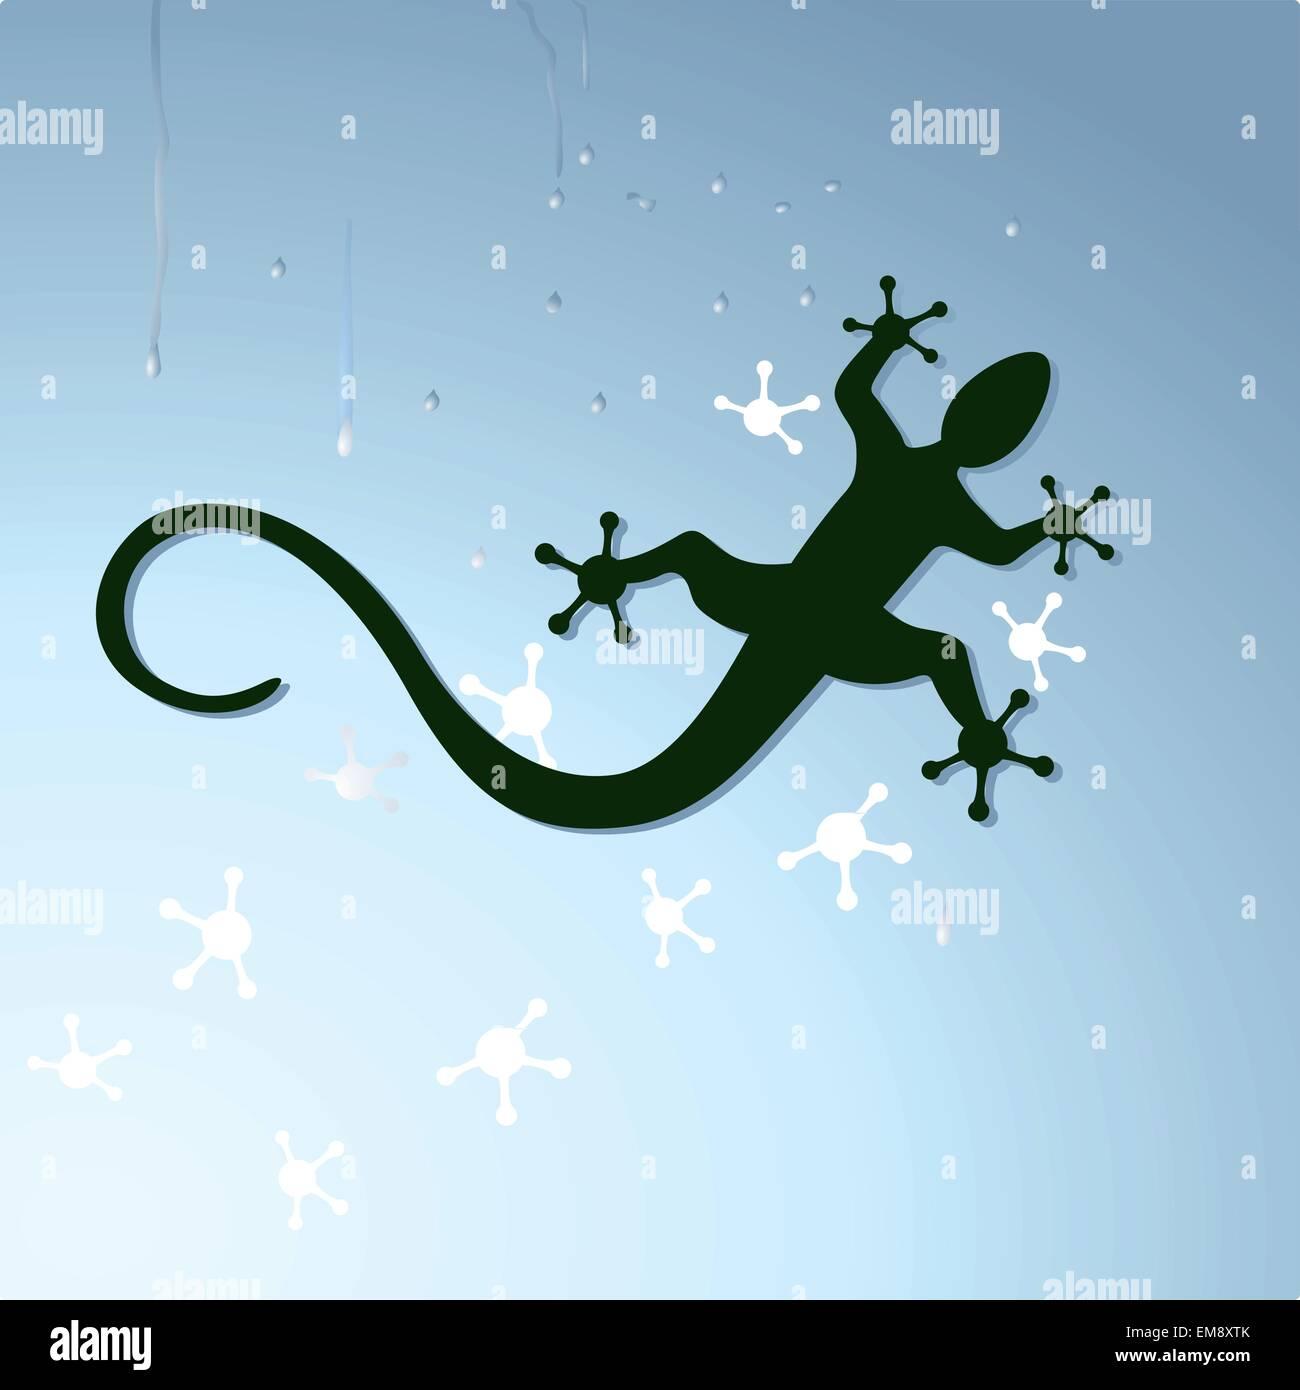 gecko to crawl - Stock Image